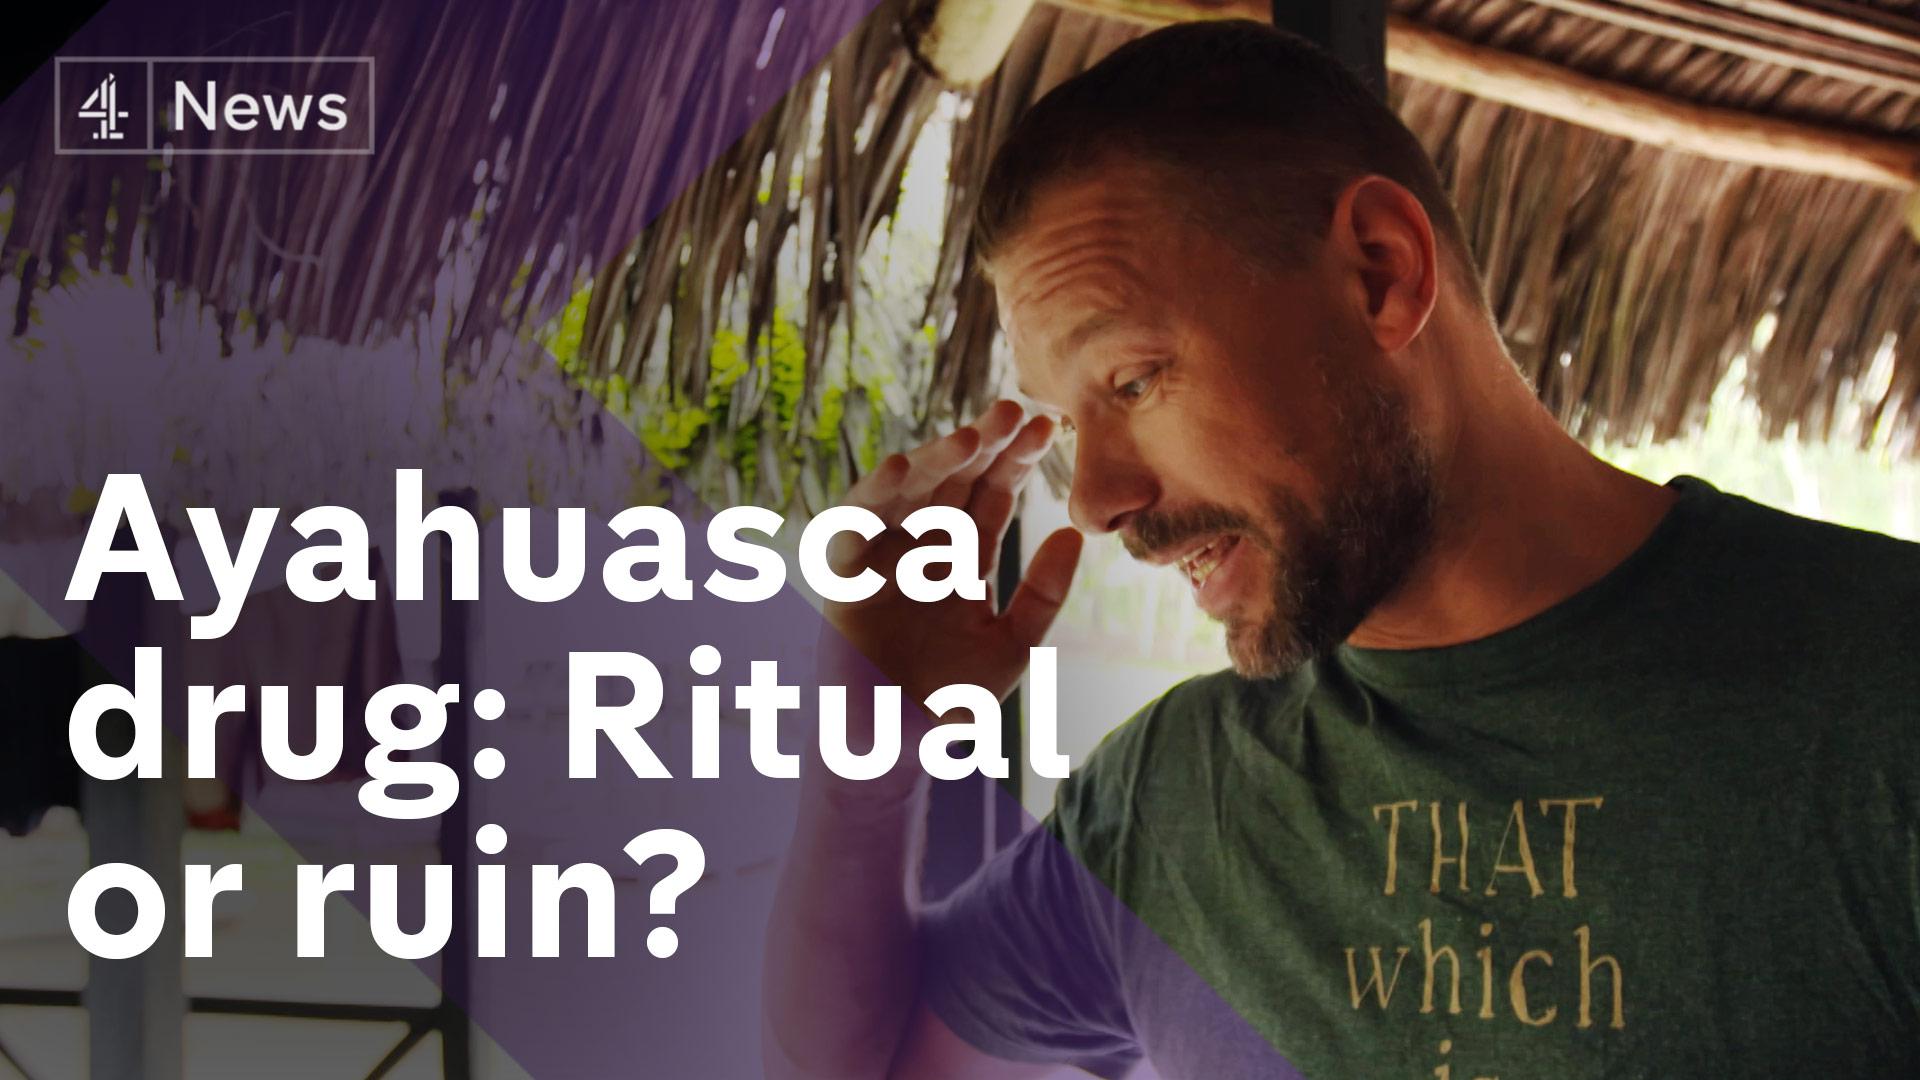 The fatal thirst for Peru's Ayahuasca drug